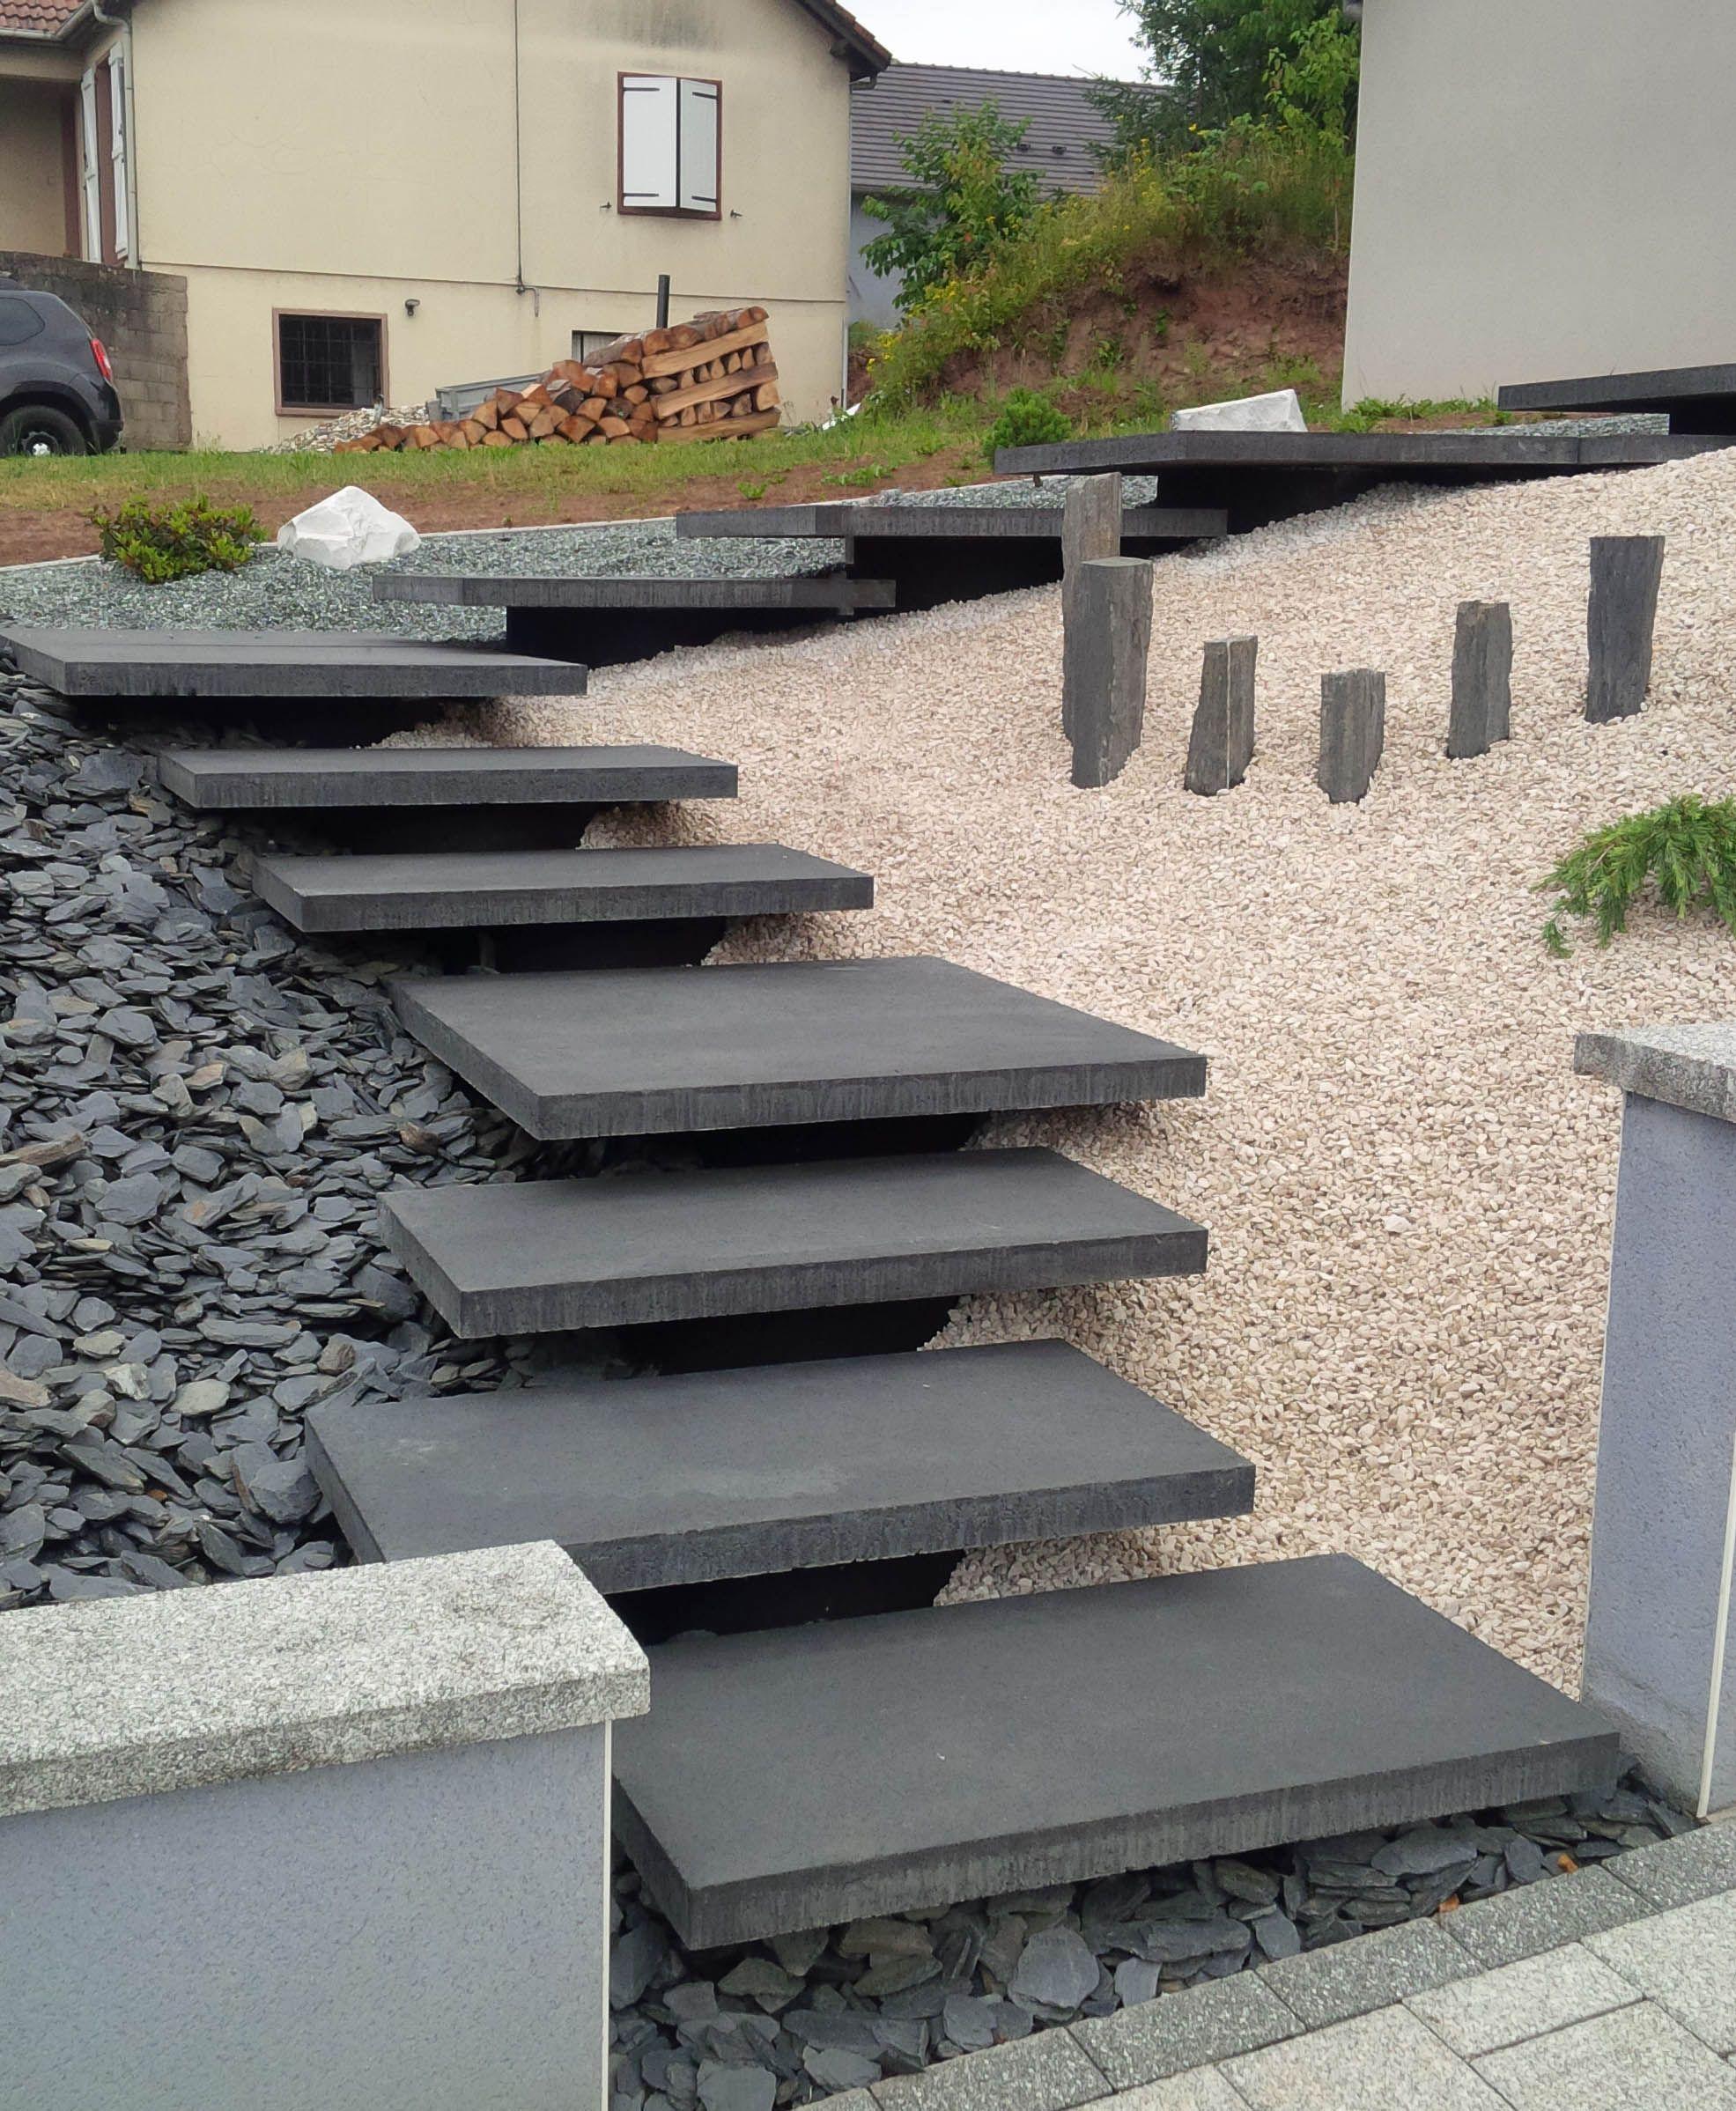 Infinito Moderno Vesuvio Garden Stairs Exterior Stairs Landscape Stairs